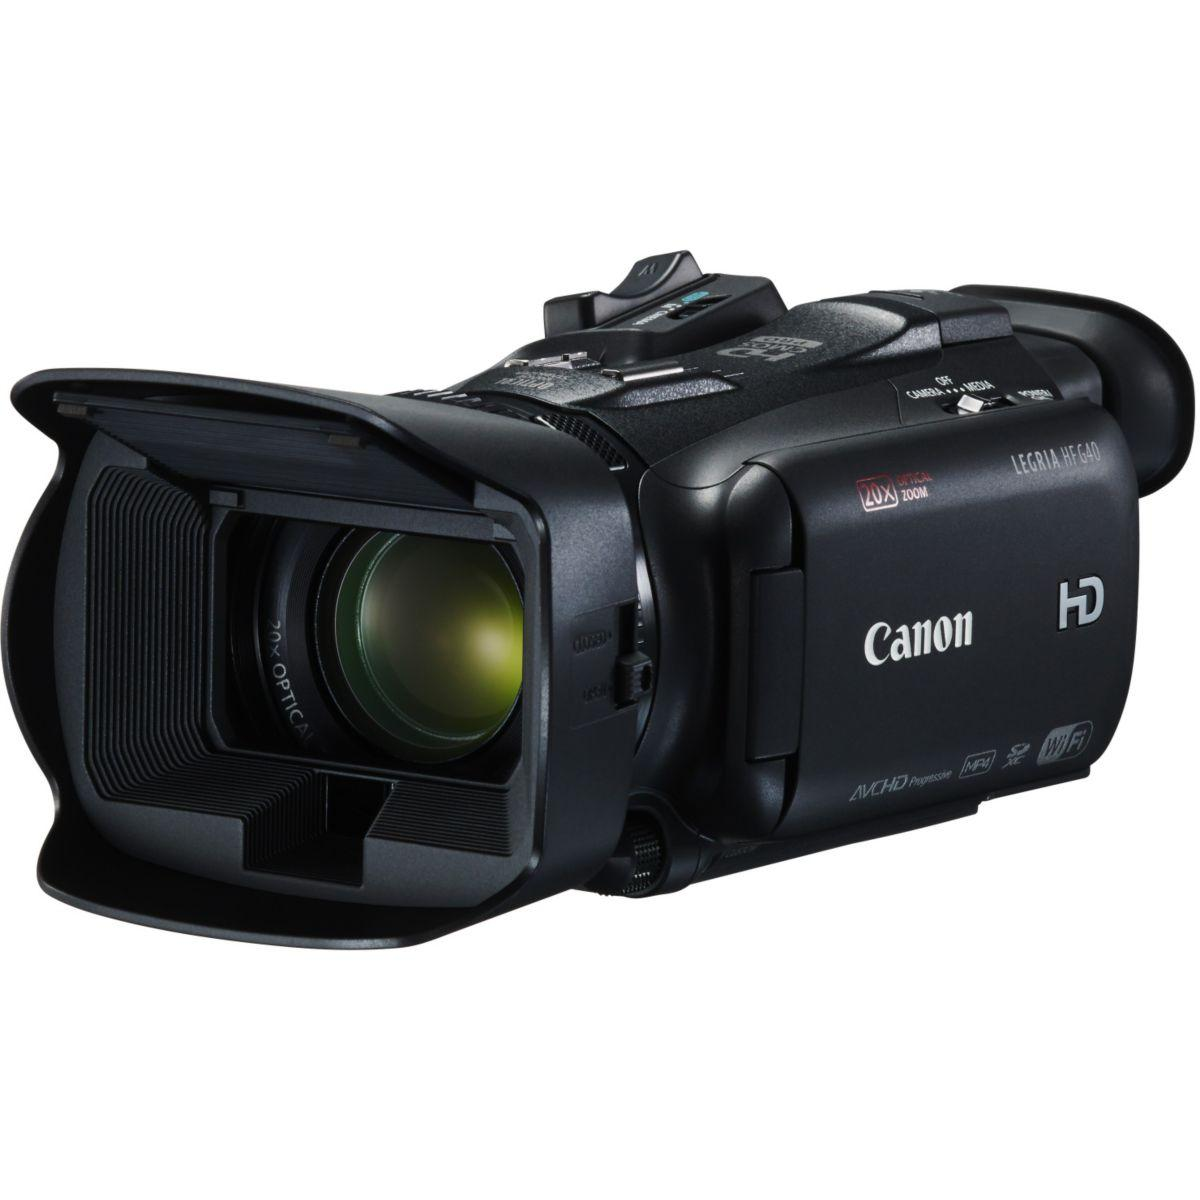 Camescope canon hf g40 - 2% de remise imm?diate avec le code :...